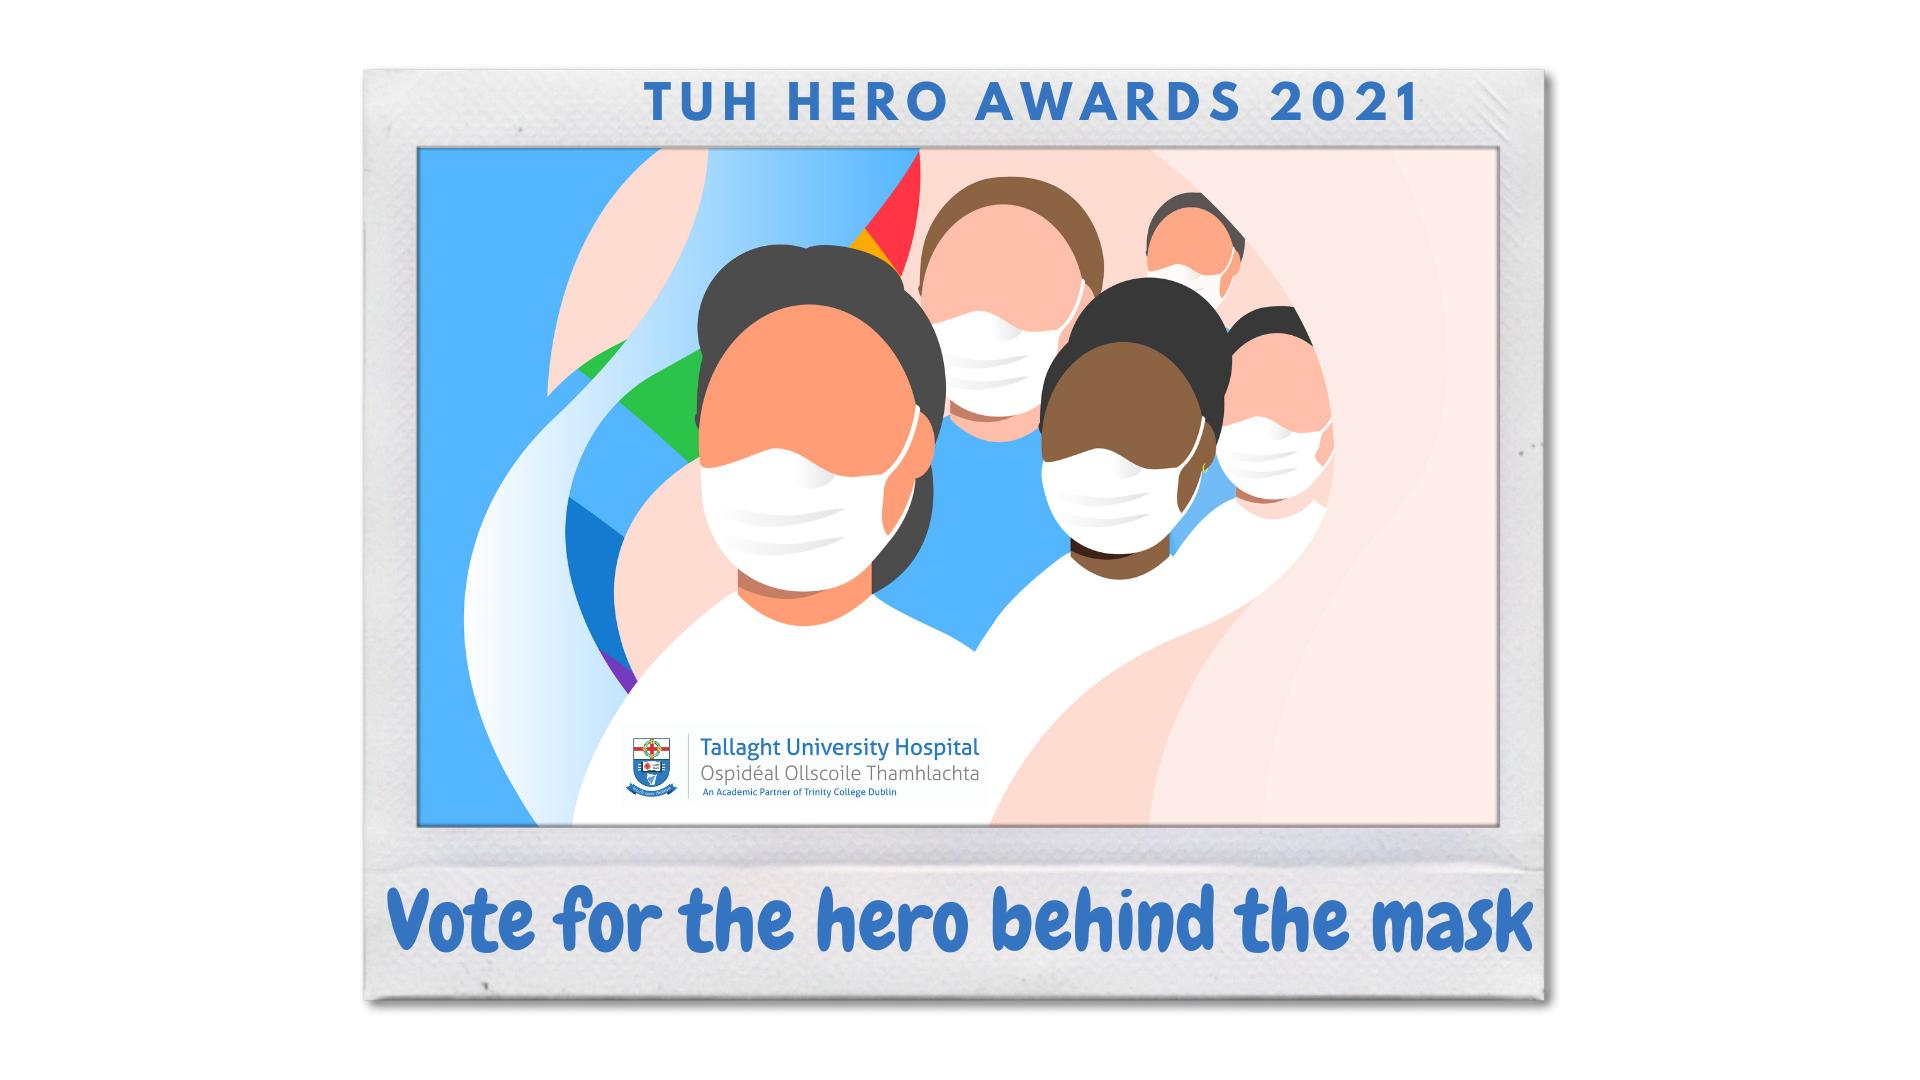 TUH Heroes Image 1 public nomination